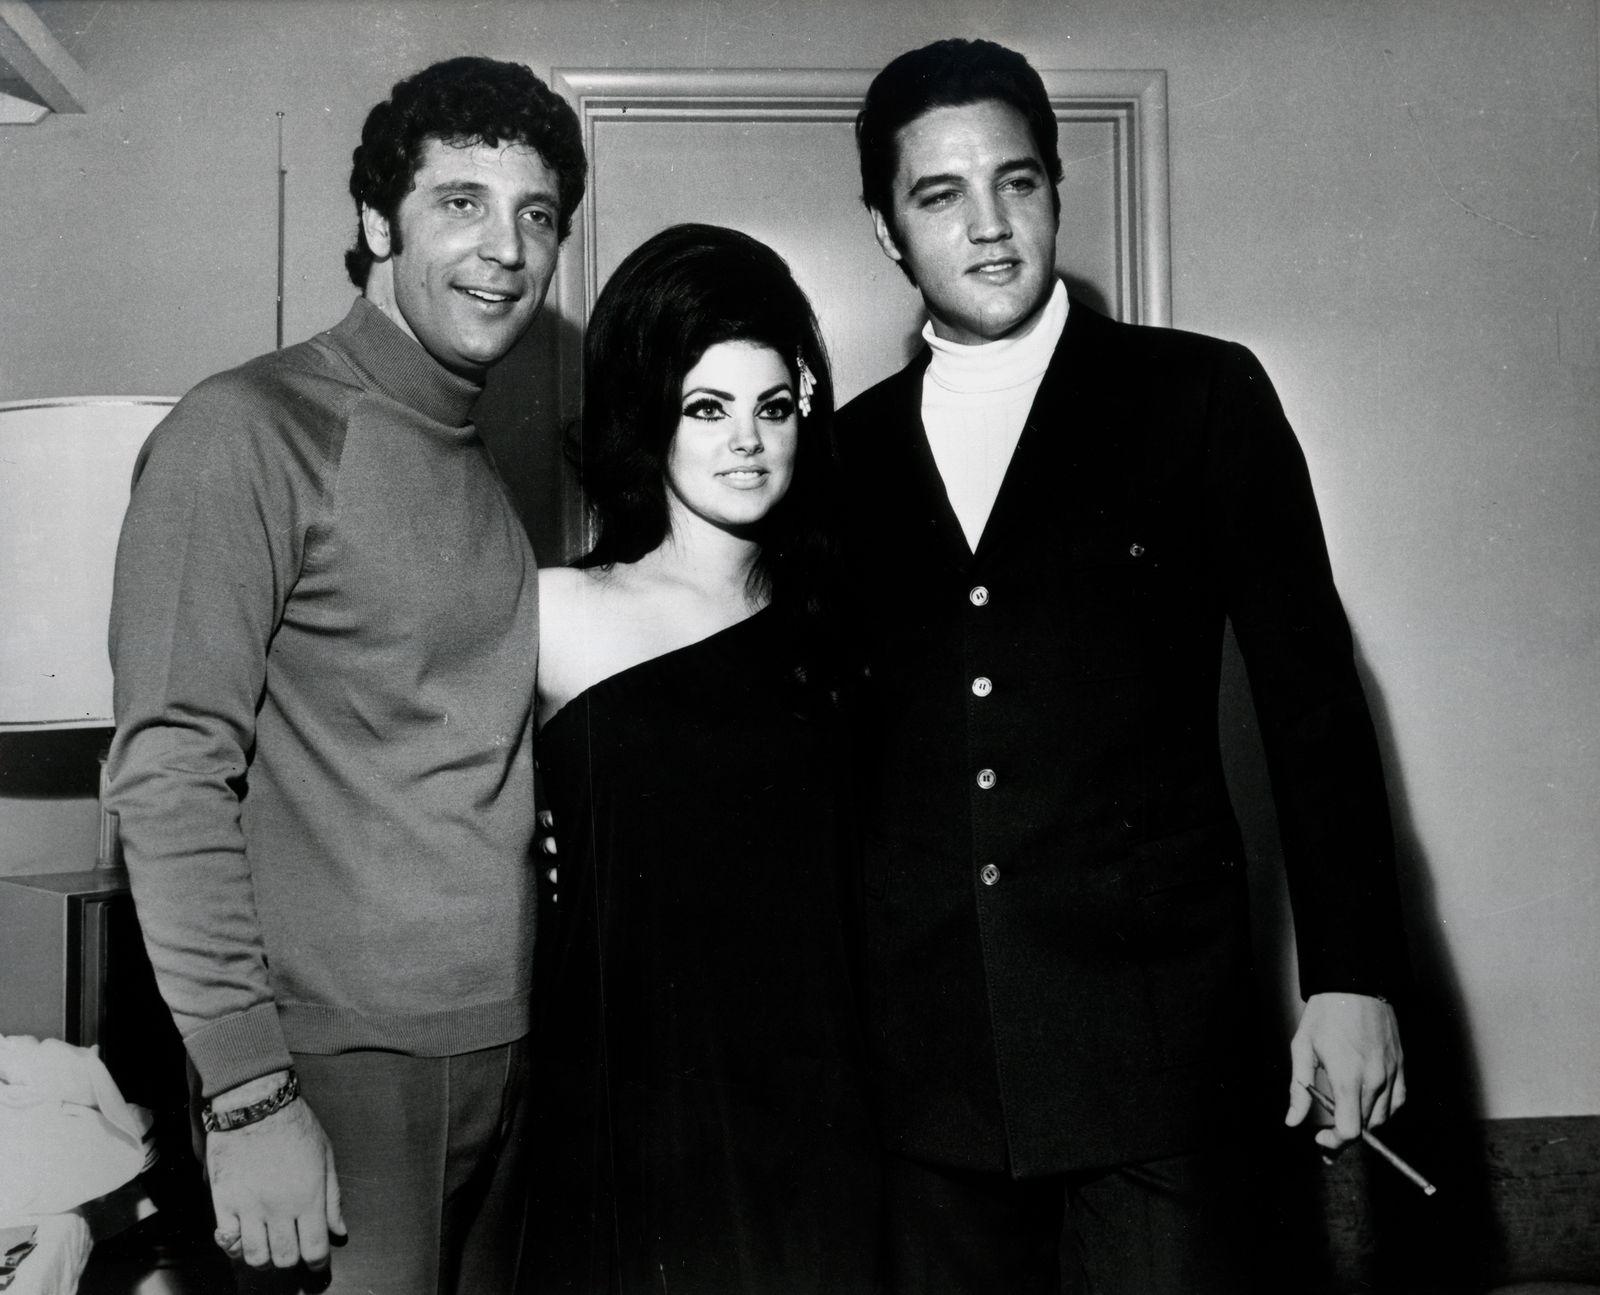 Elvis Presley and Priscilla Presley with Tom Jones